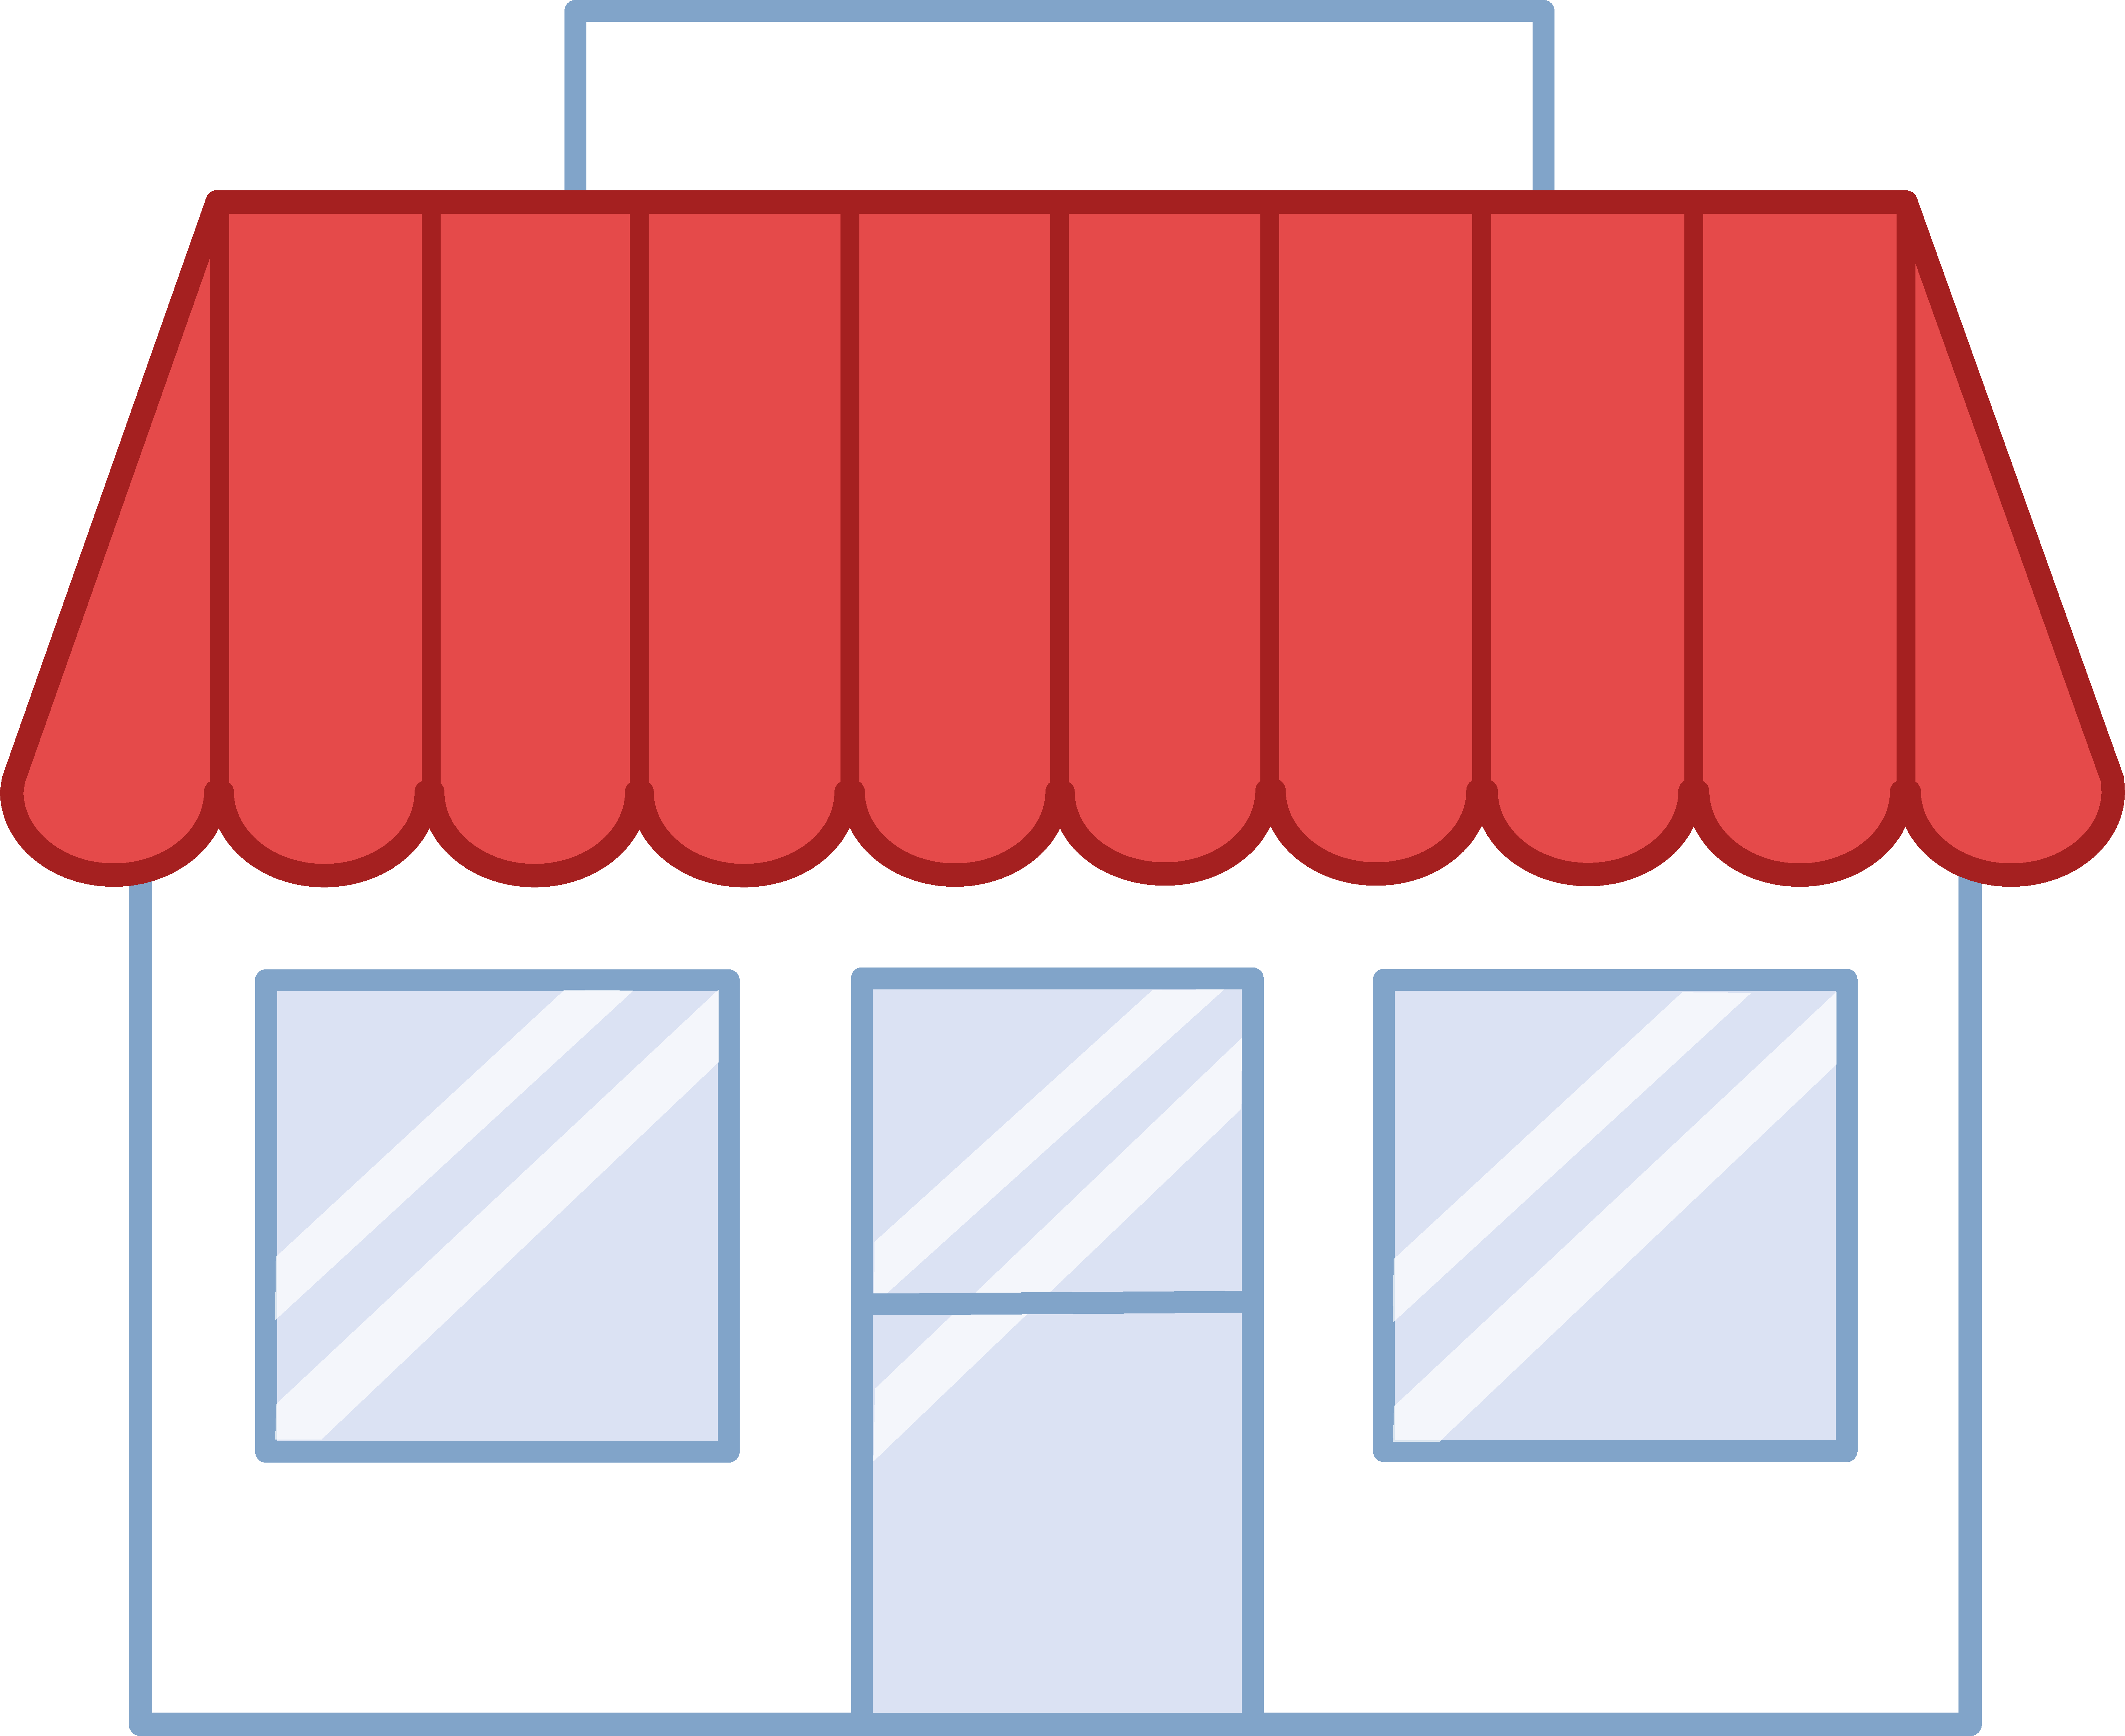 5628x4597 Store Building Free Clipart Clipart Building